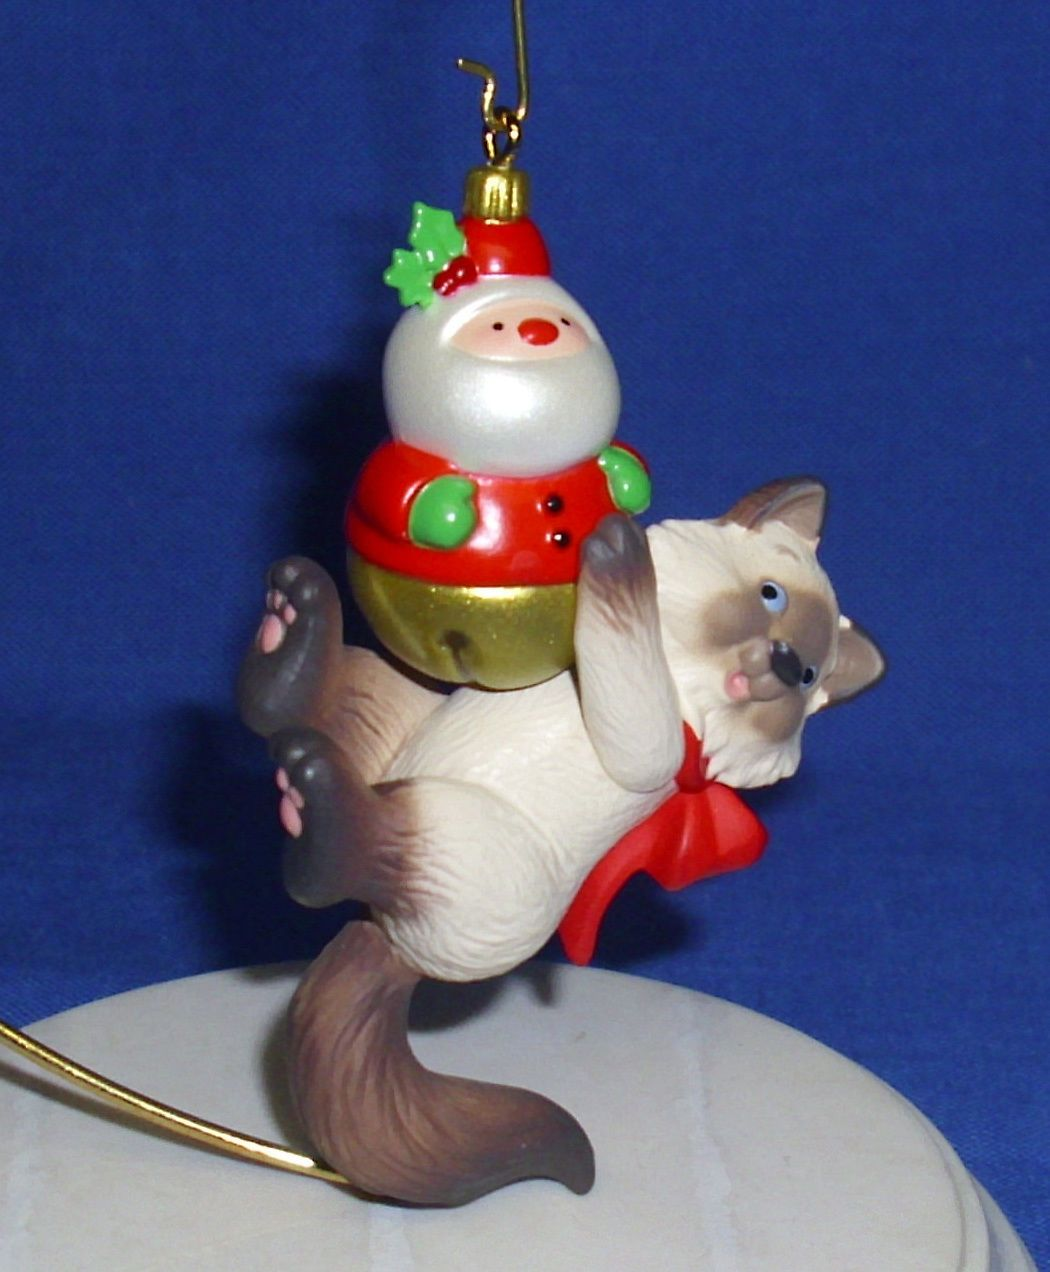 Hallmark Ornament Mischievous Kittens 15 2013 Siamese Cat With Santa Toy Ebay Cat Christmas Ornaments Christmas Clay Hallmark Ornaments